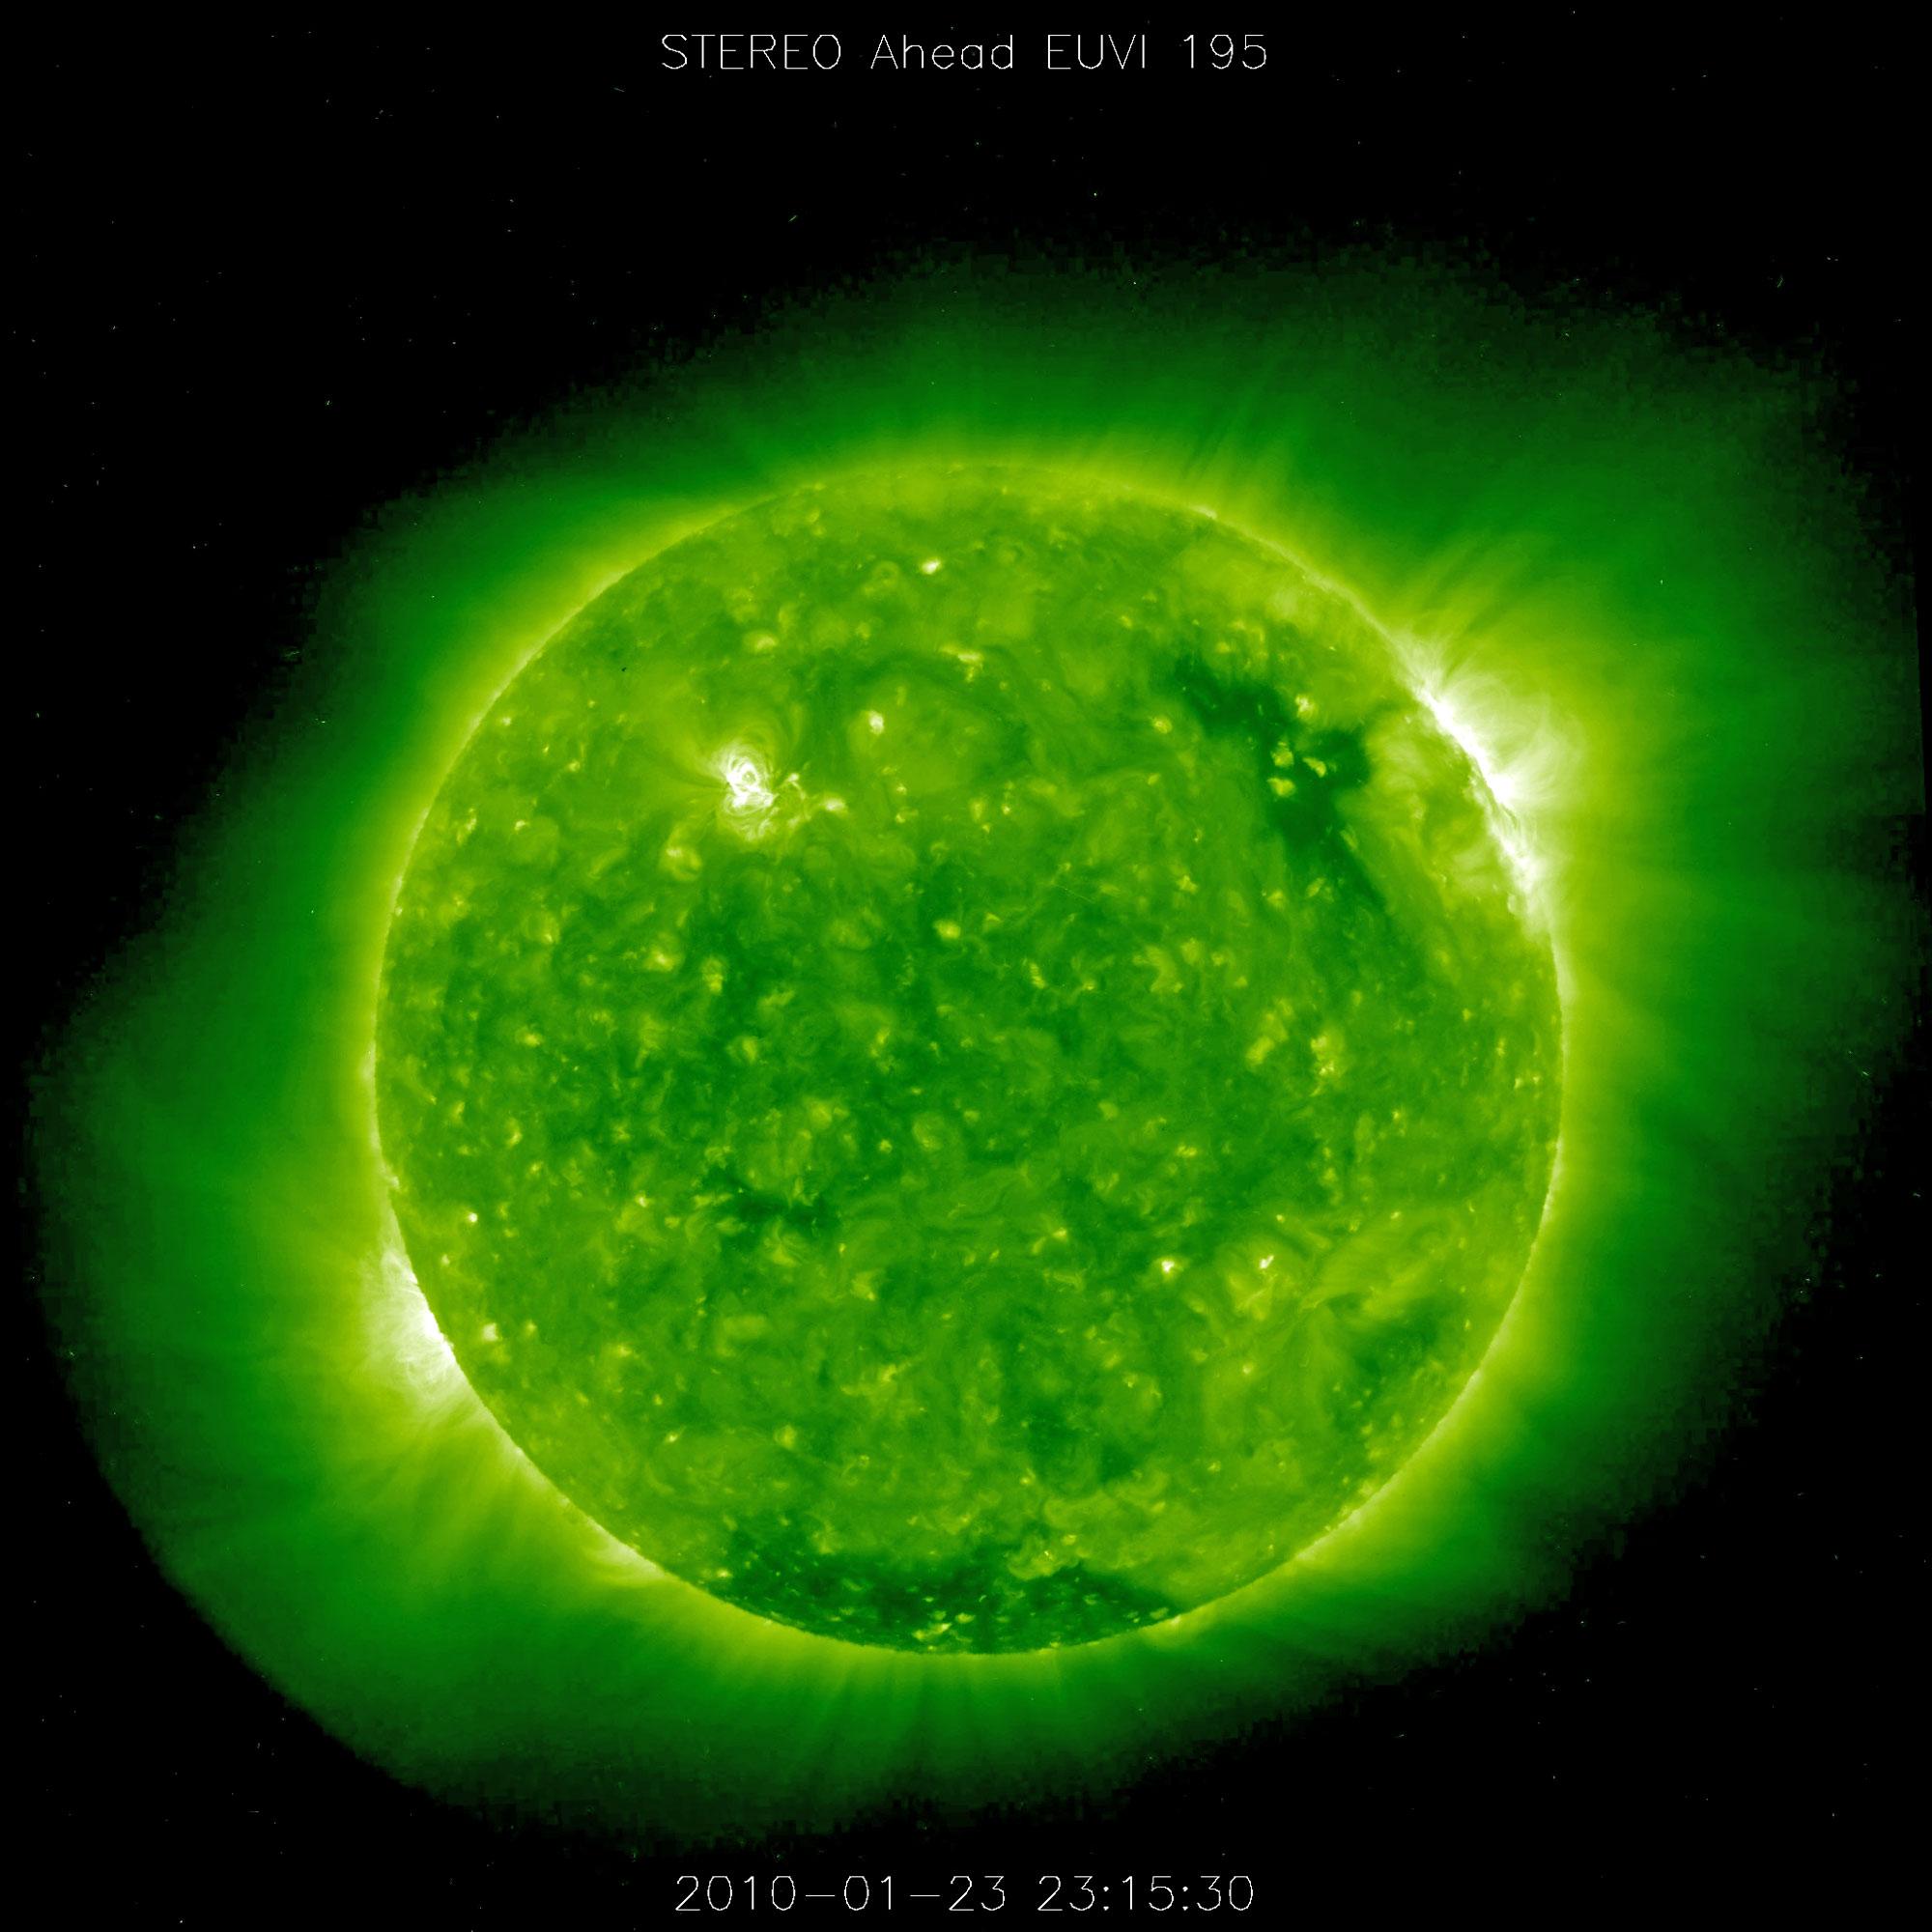 Giant UFOs Around The Sun? NASA Claims Malfunction ...